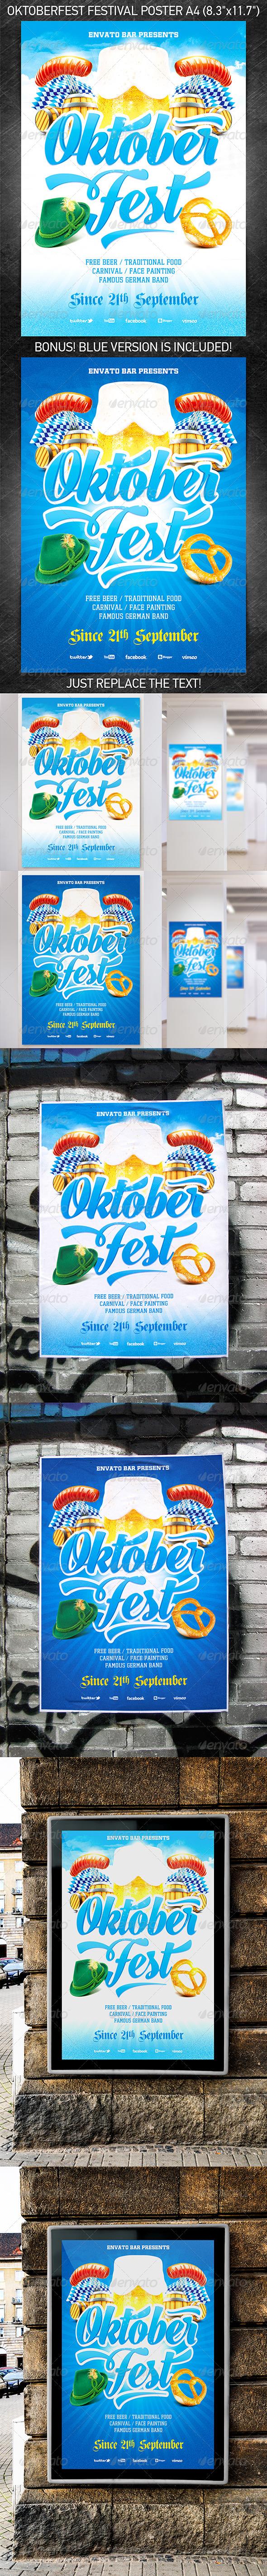 Oktoberfest Festival Poster Vol.2